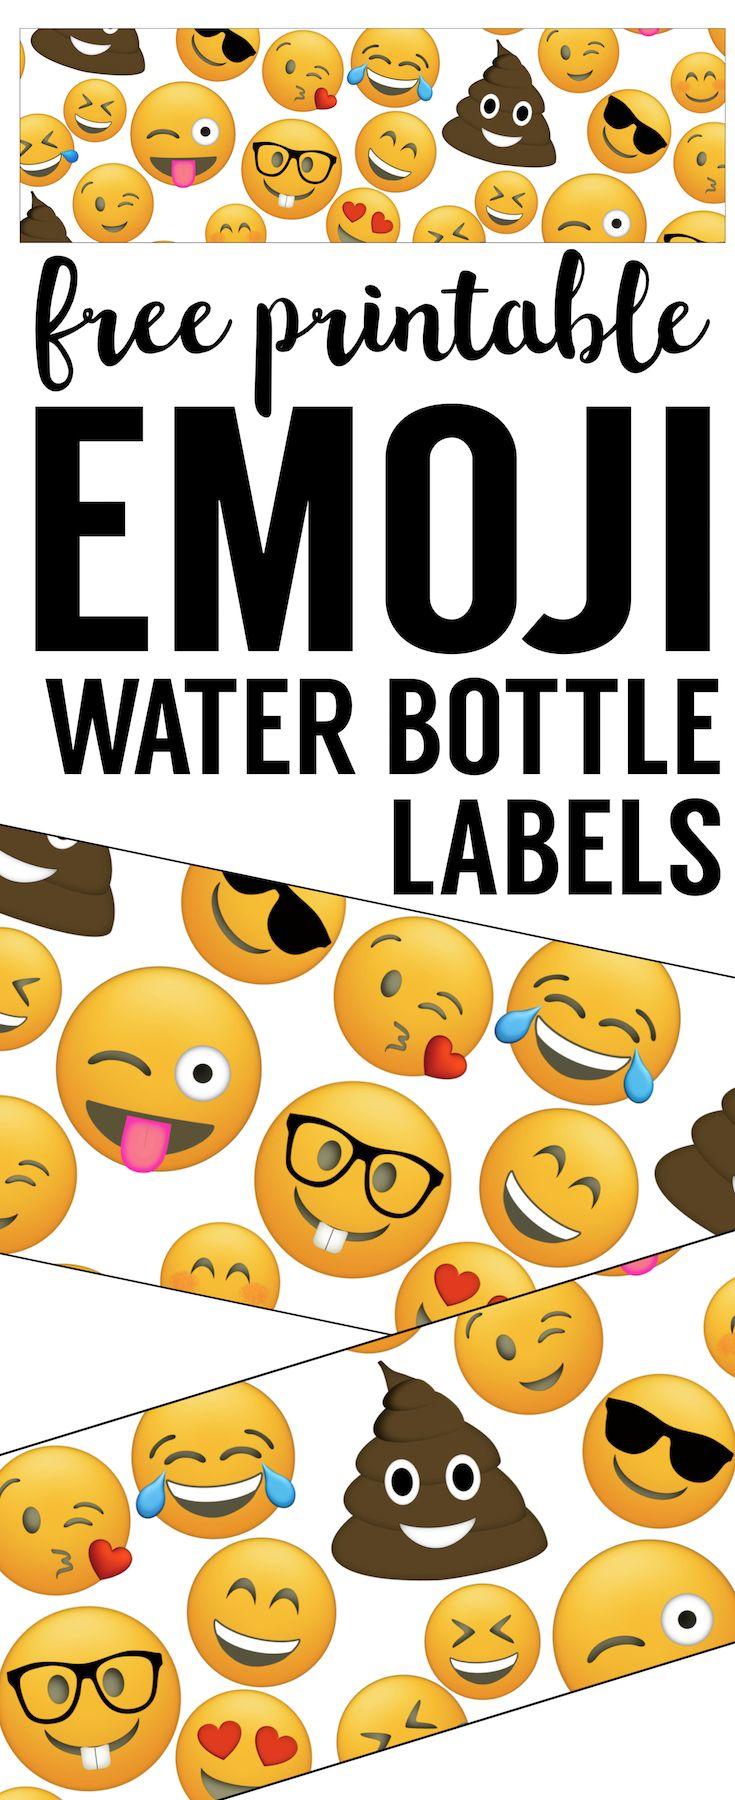 Emoji Water Bottle Labels Free Printable Paper Trail Design Labels Printables Free Water Bottle Labels Free Emoji Party Decorations